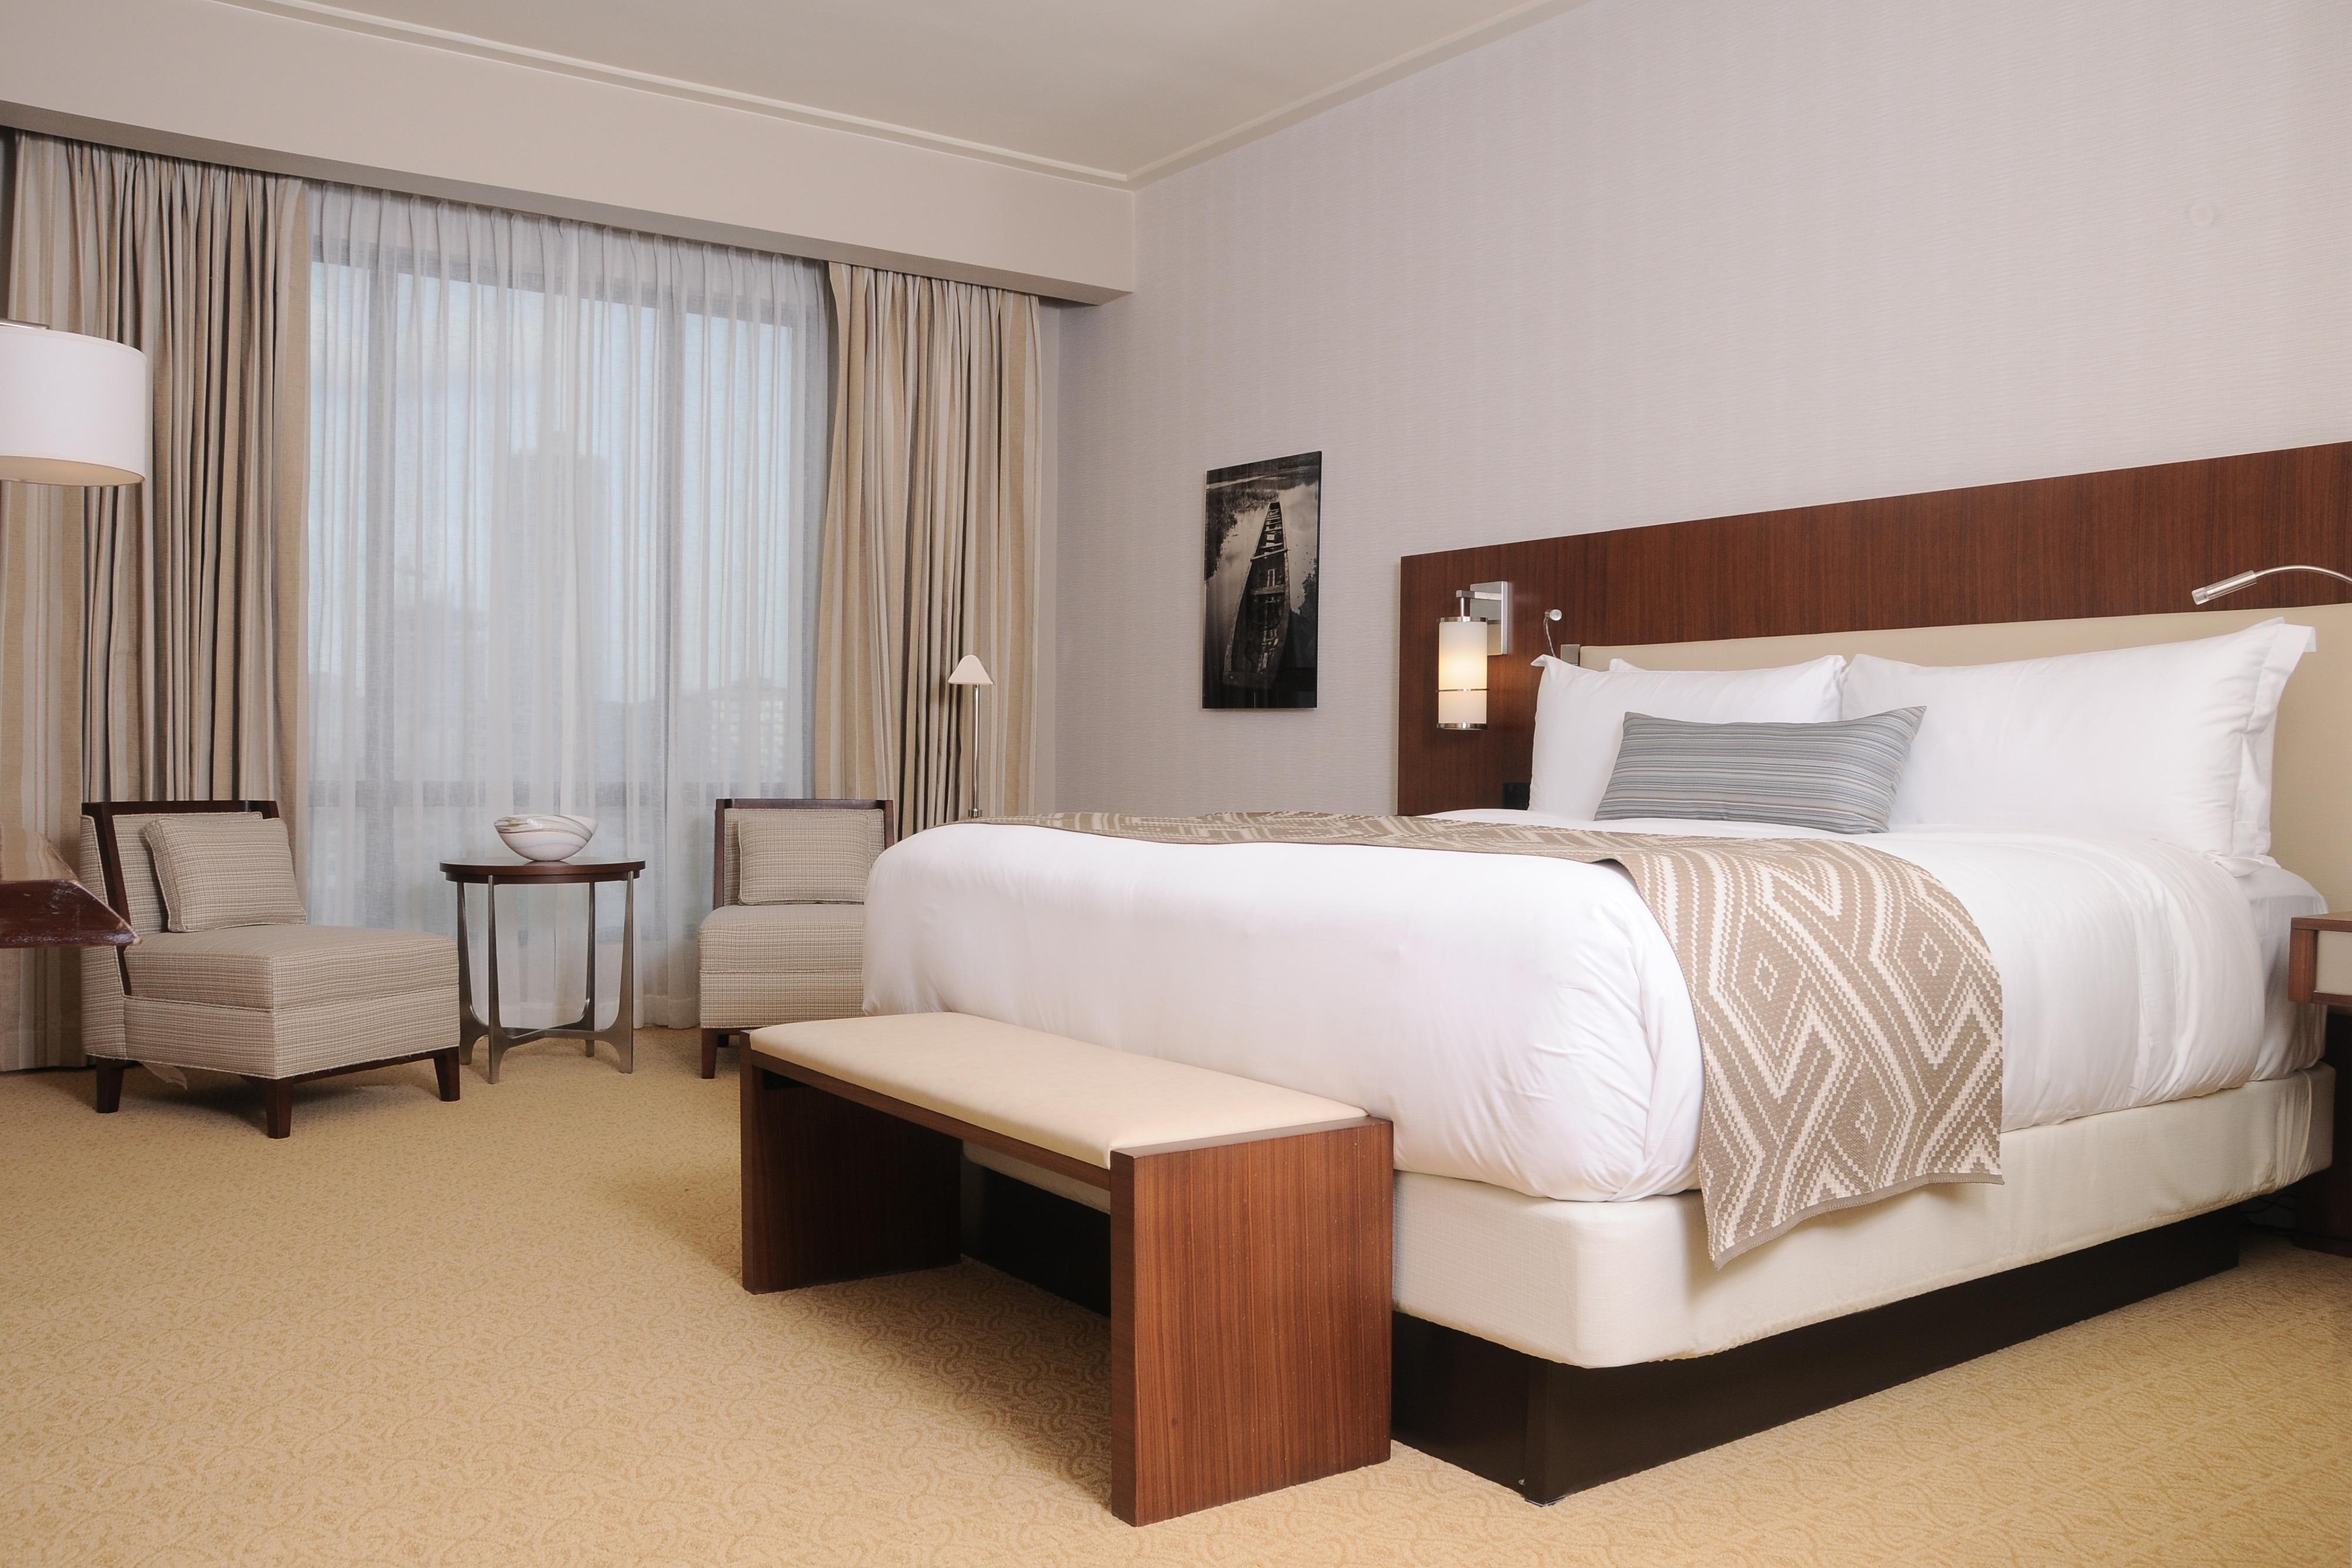 Suite Grand con cama tamaño King